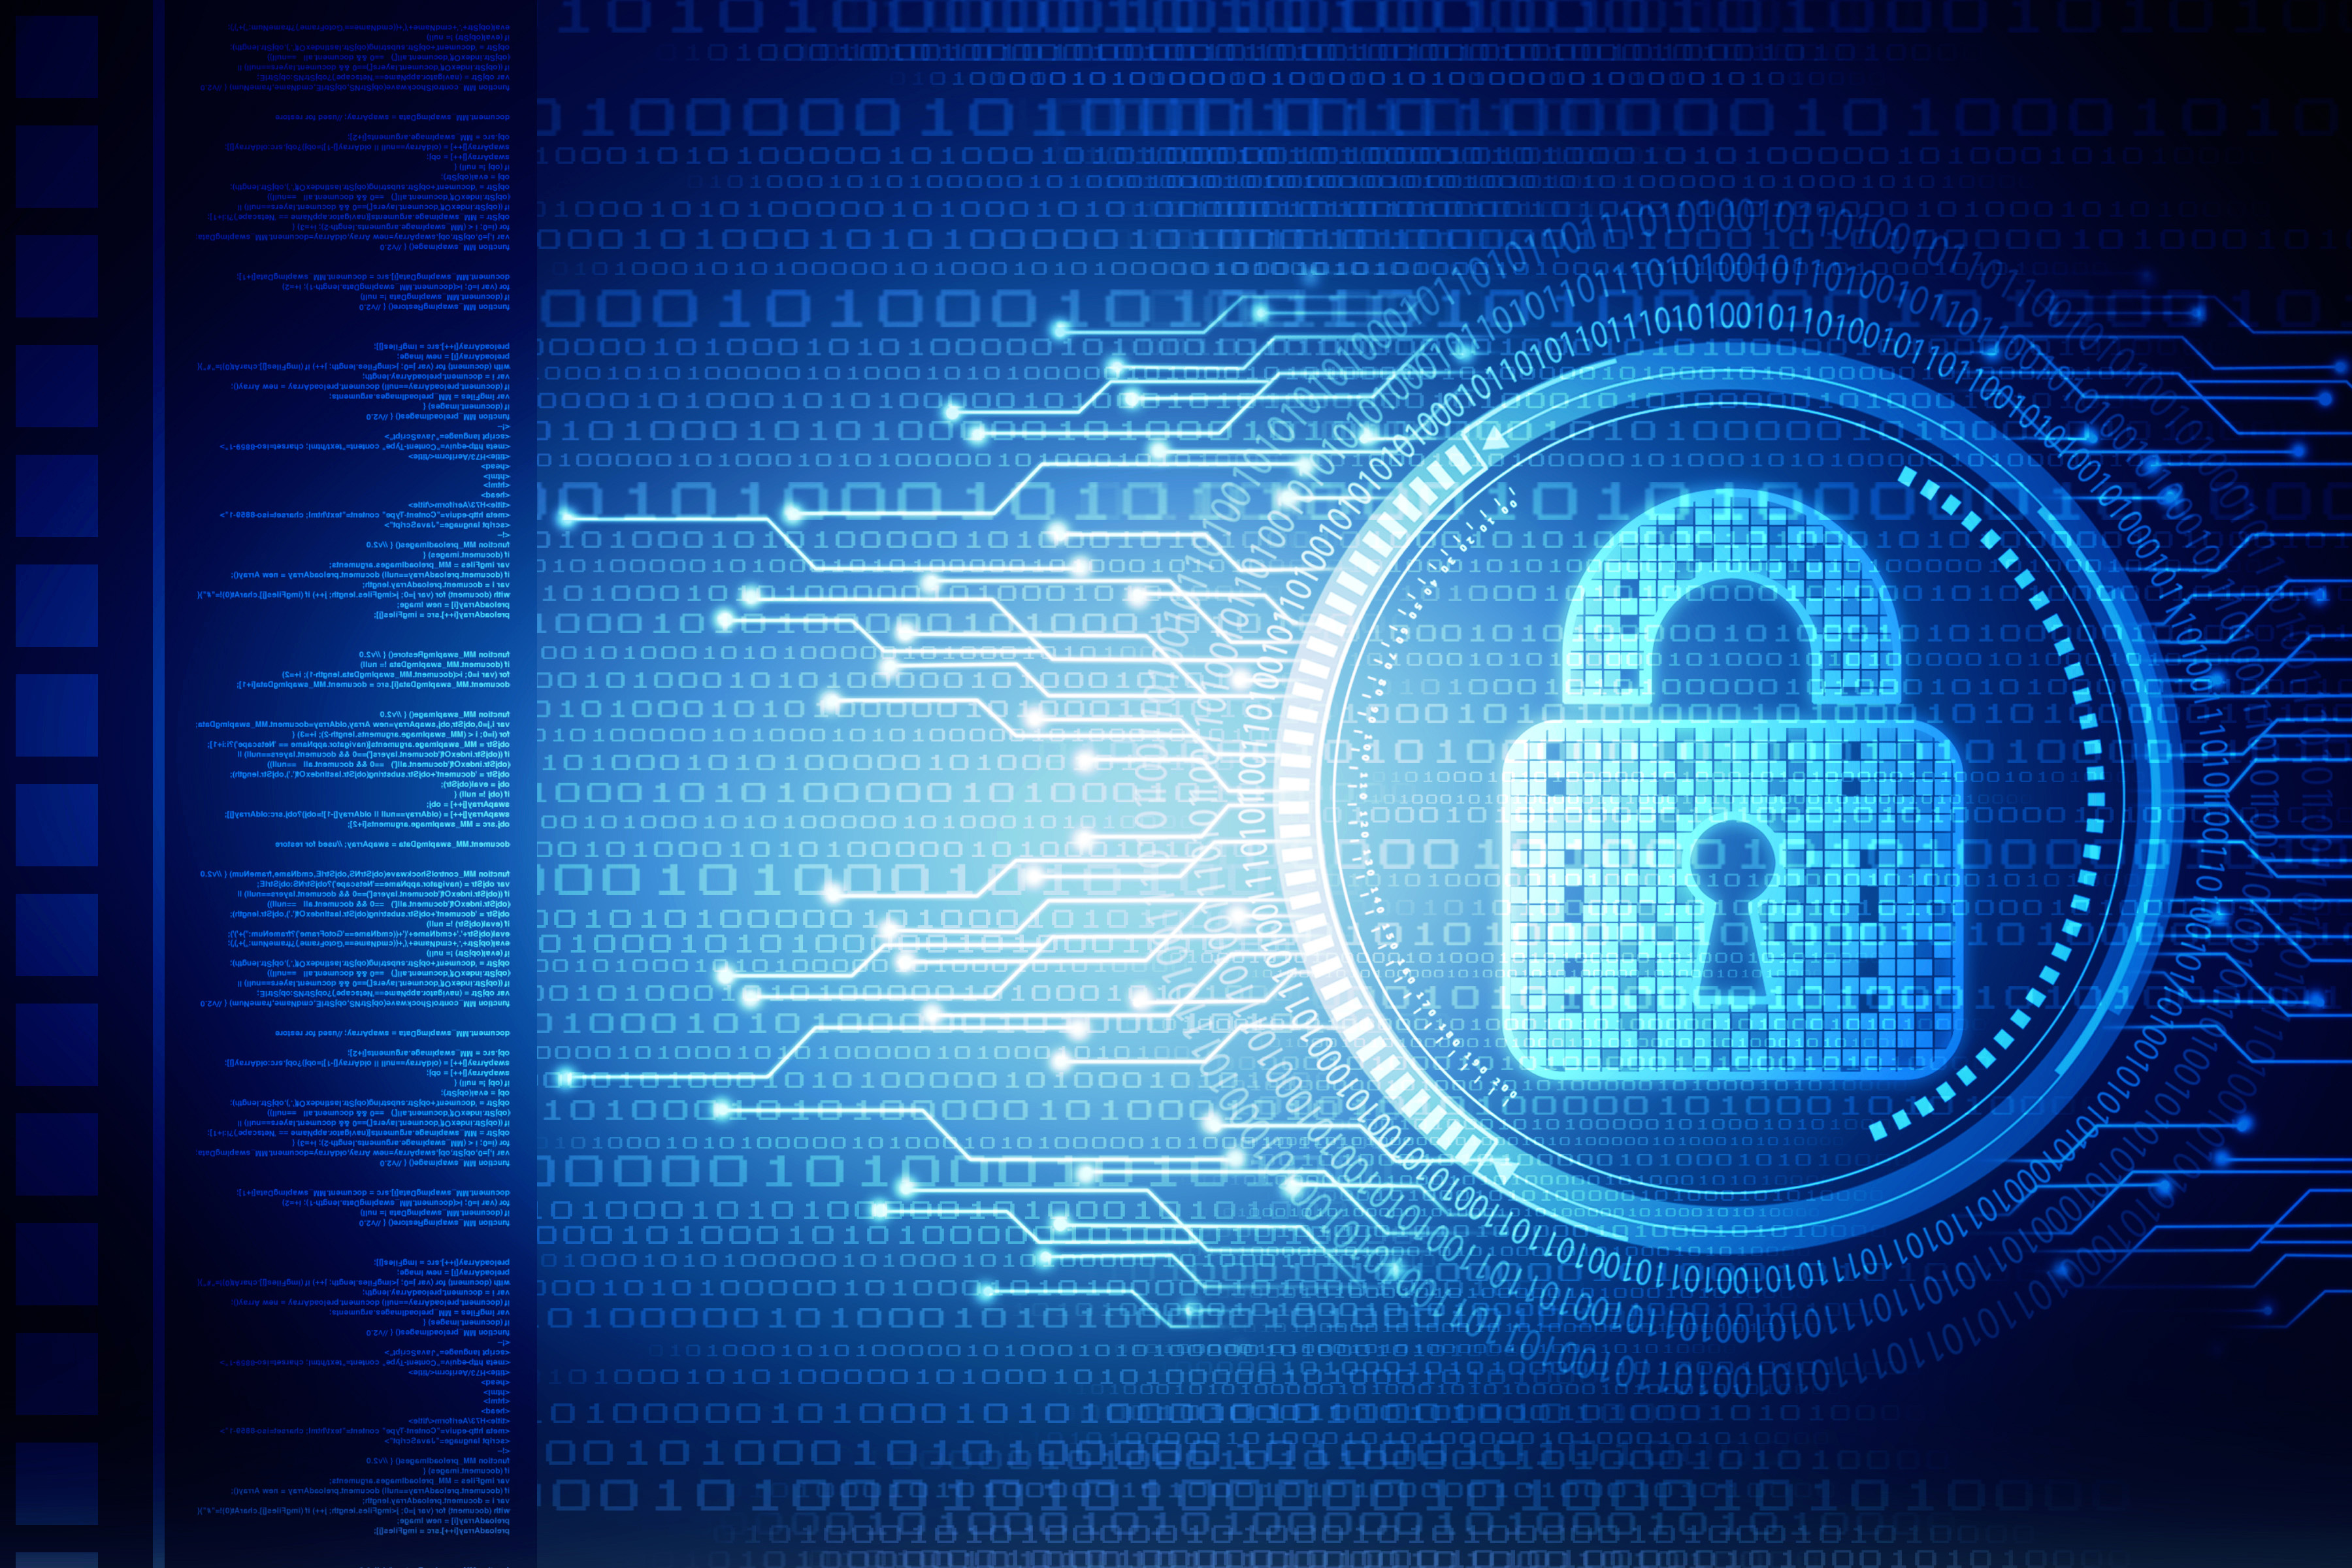 Seguro de Riscos Cibernéticos